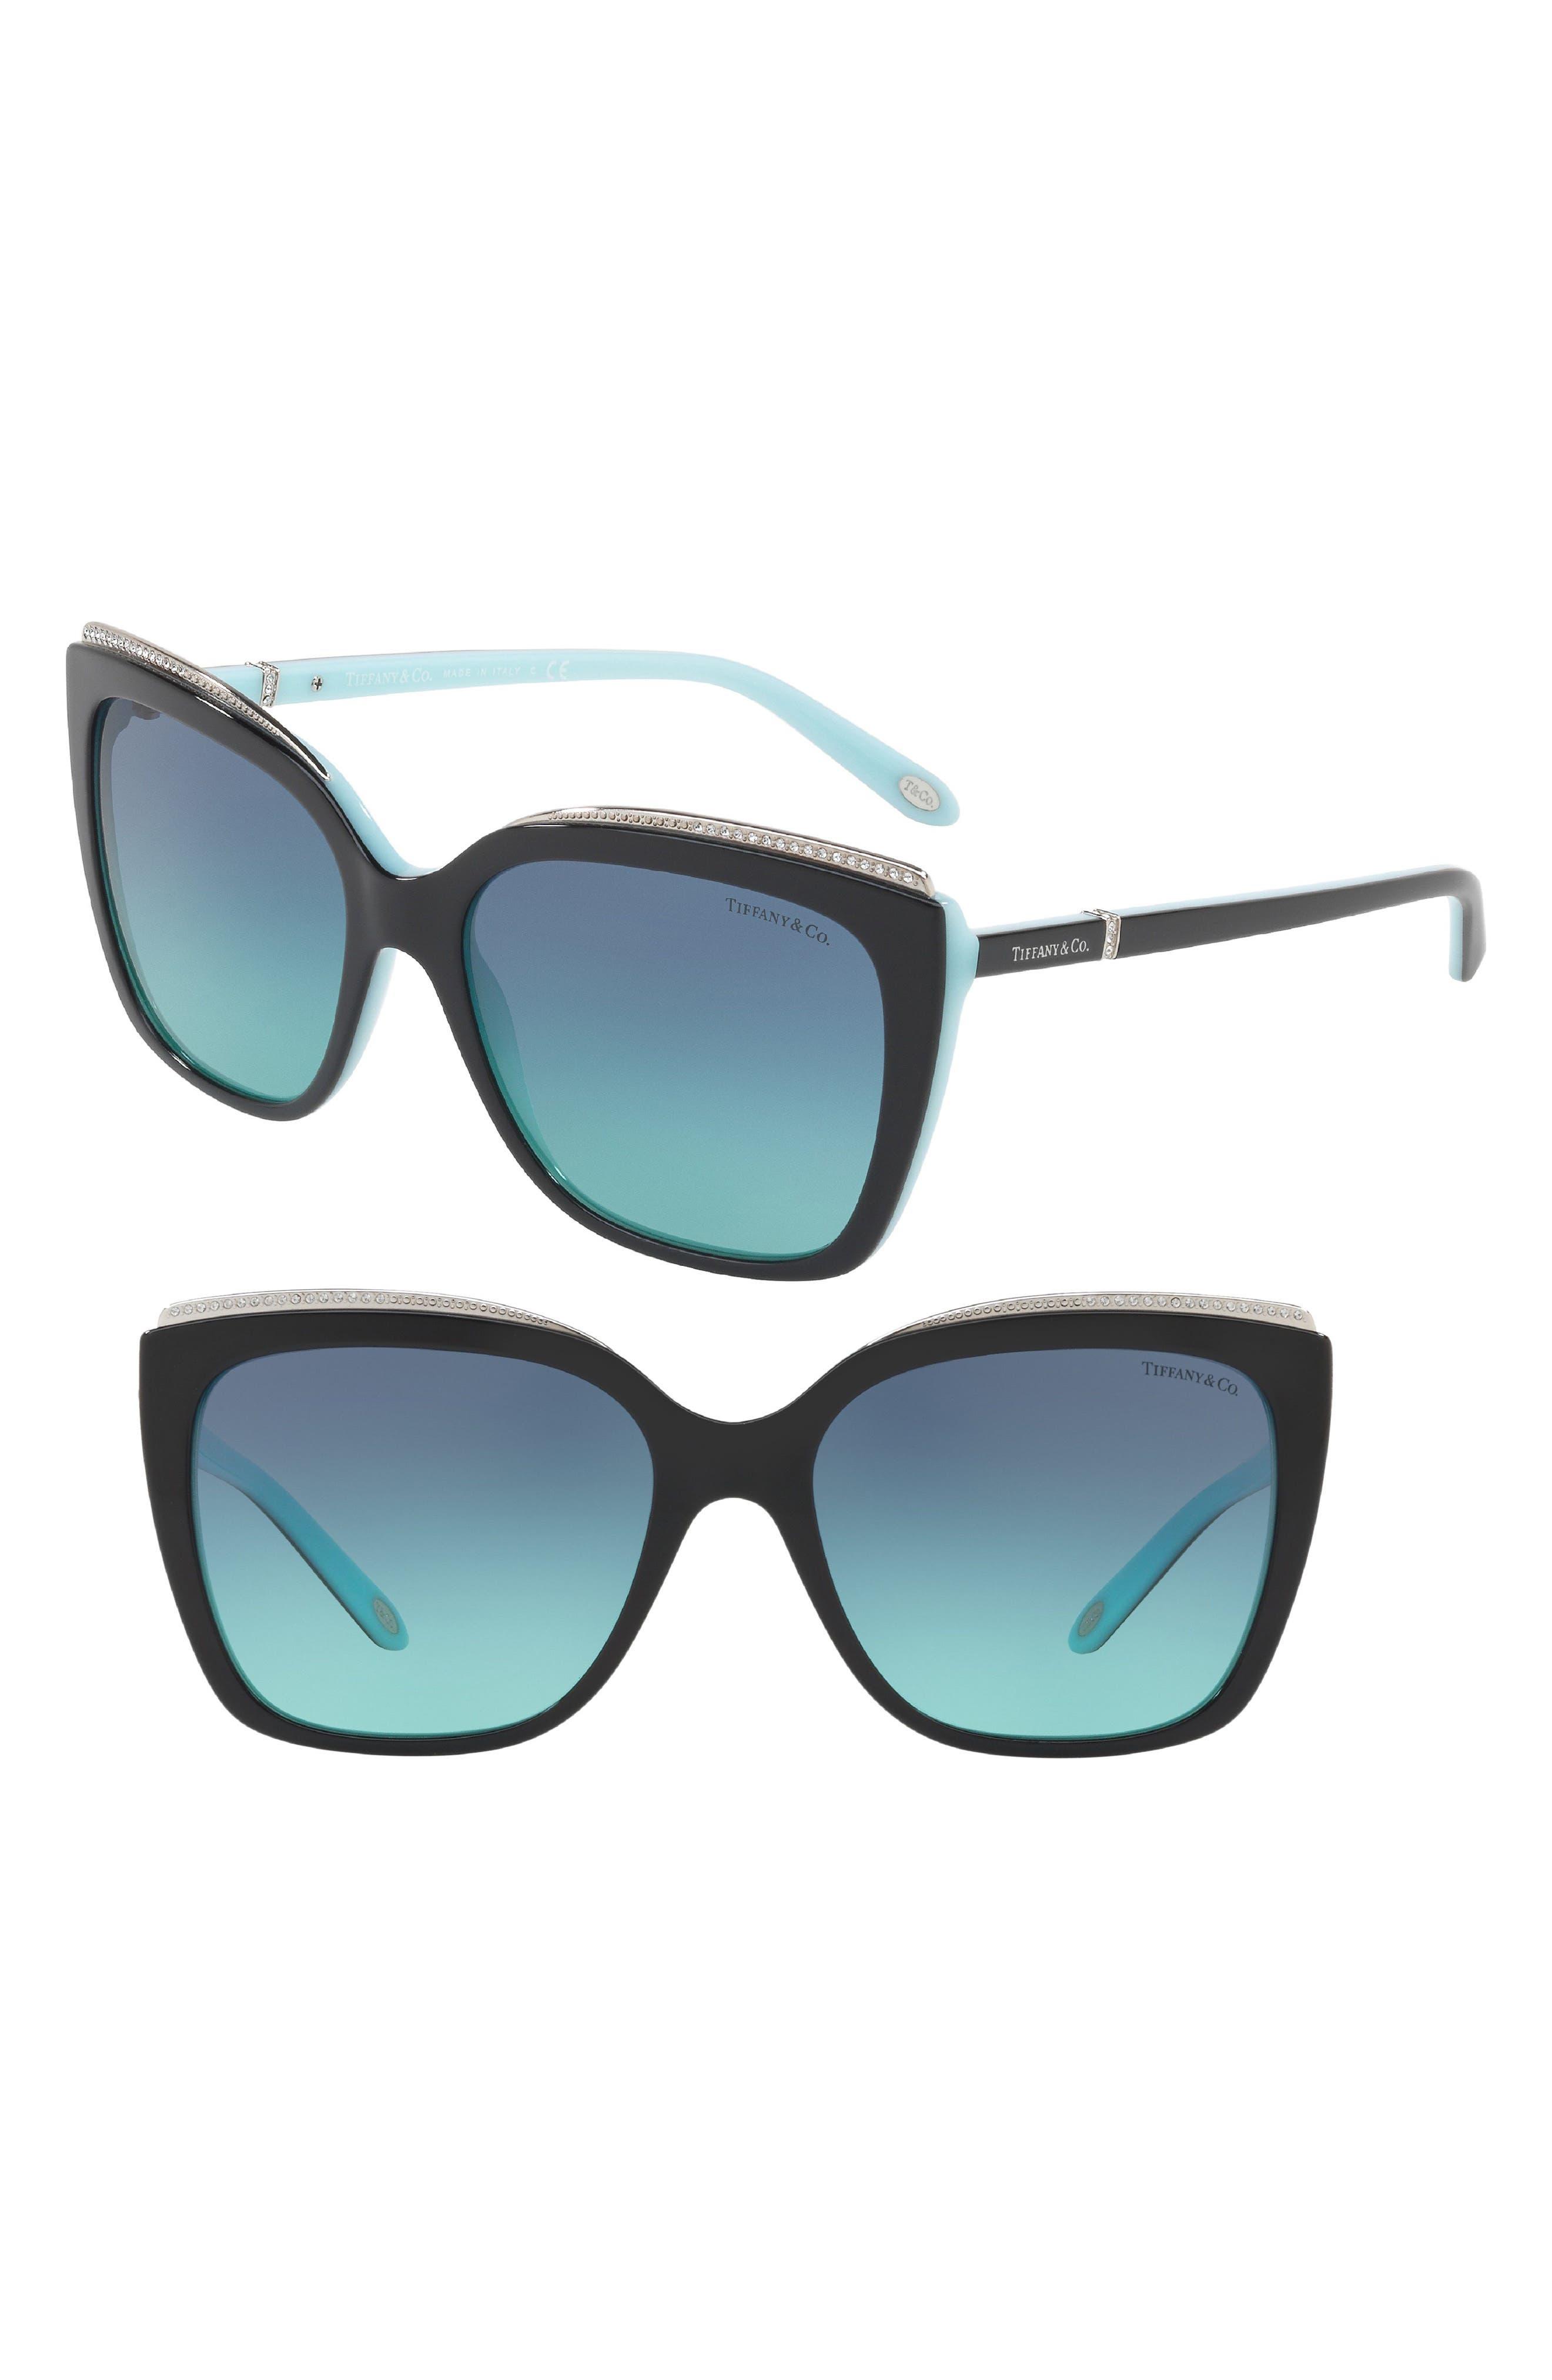 Tiffany 56mm Sunglasses,                             Main thumbnail 1, color,                             Black/ Blue